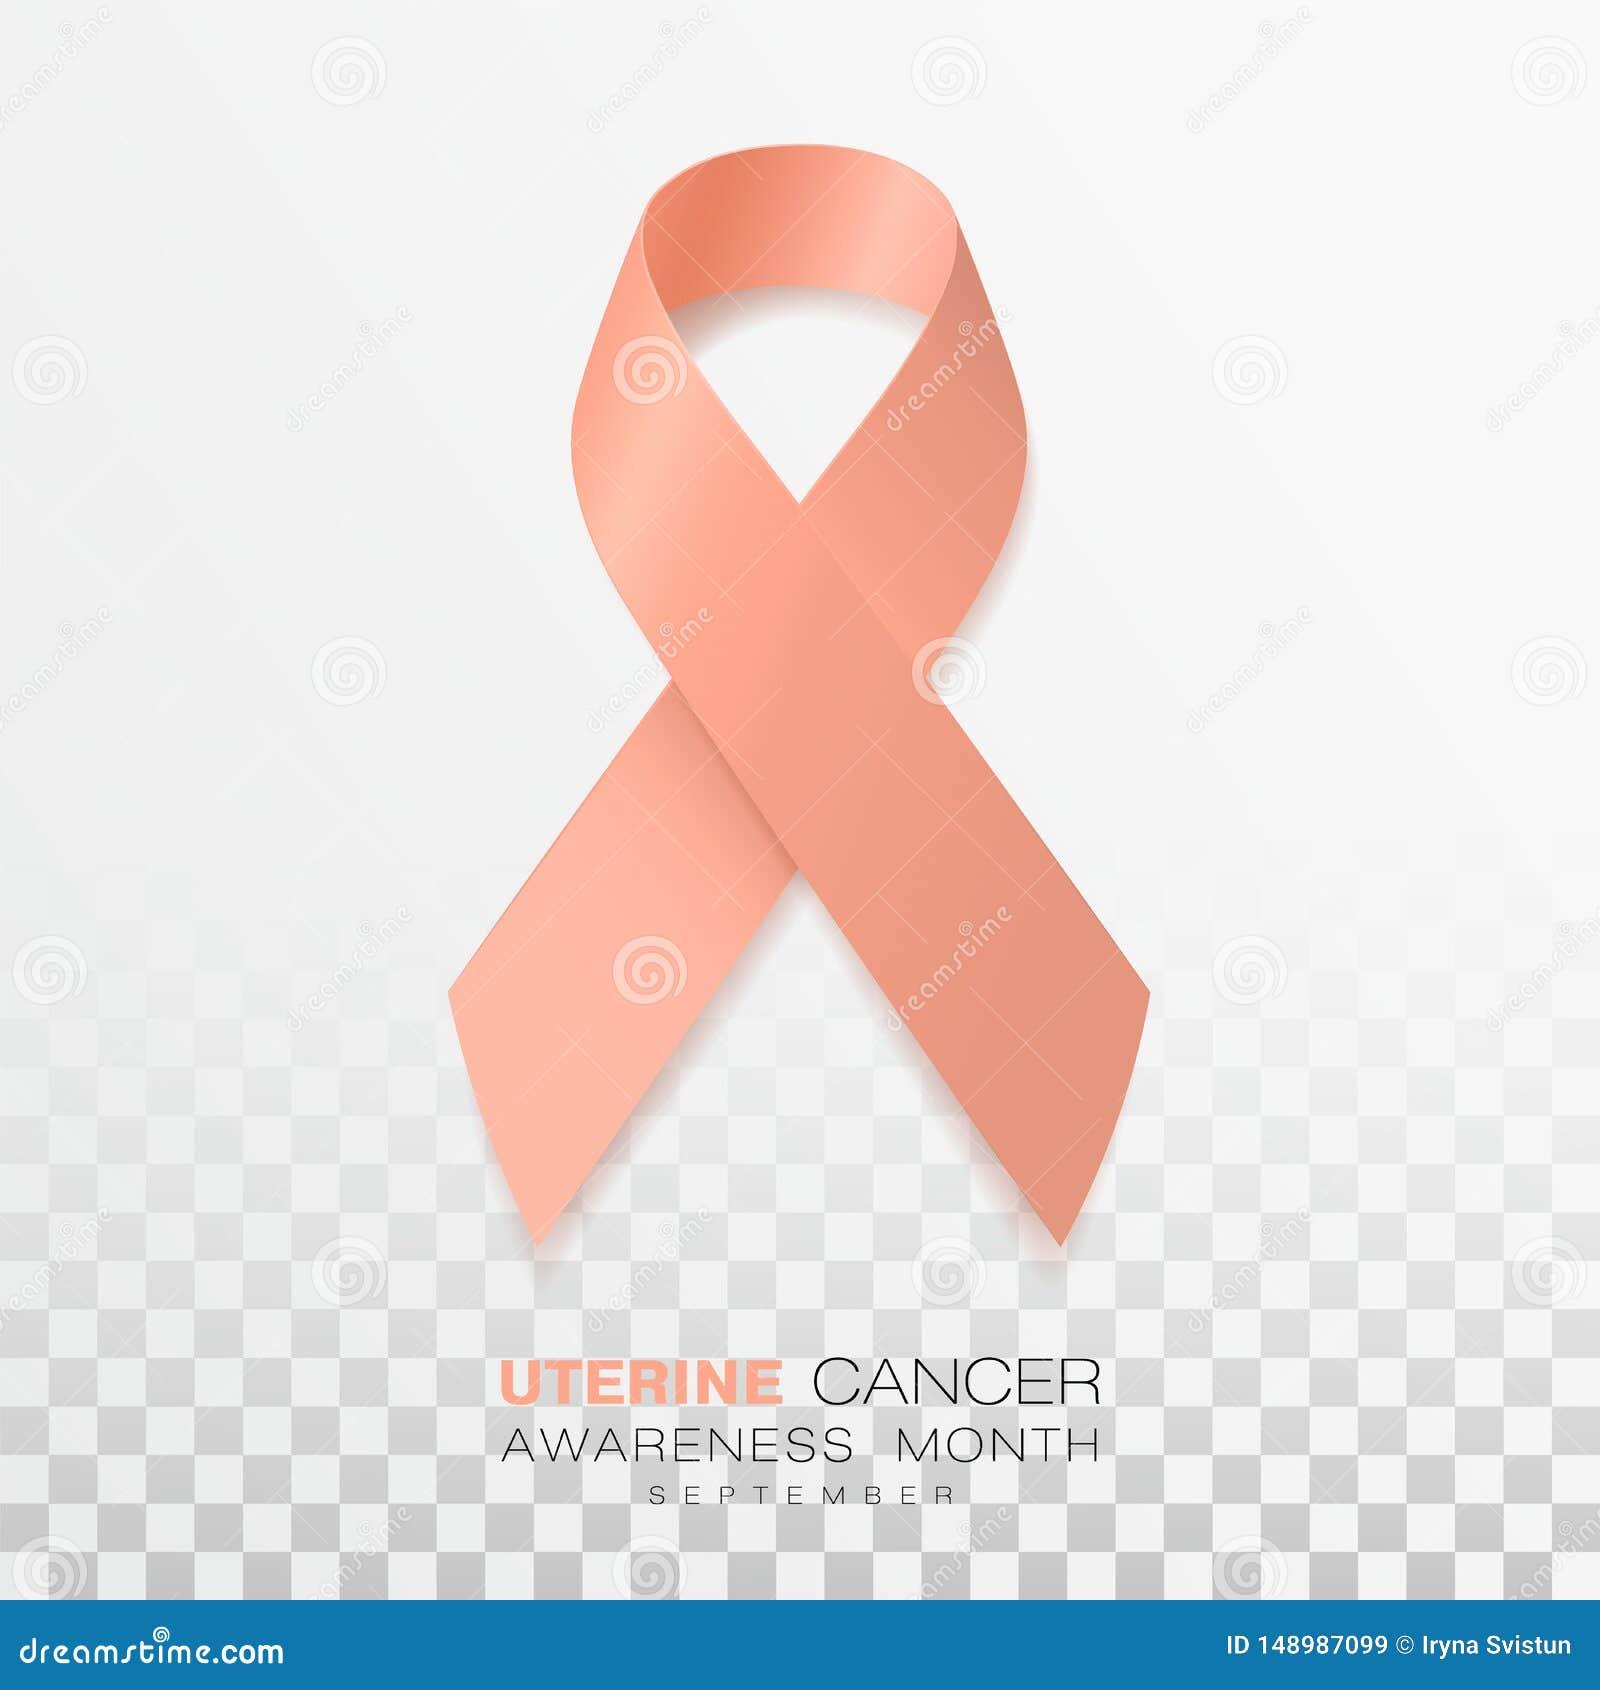 endometrial cancer color